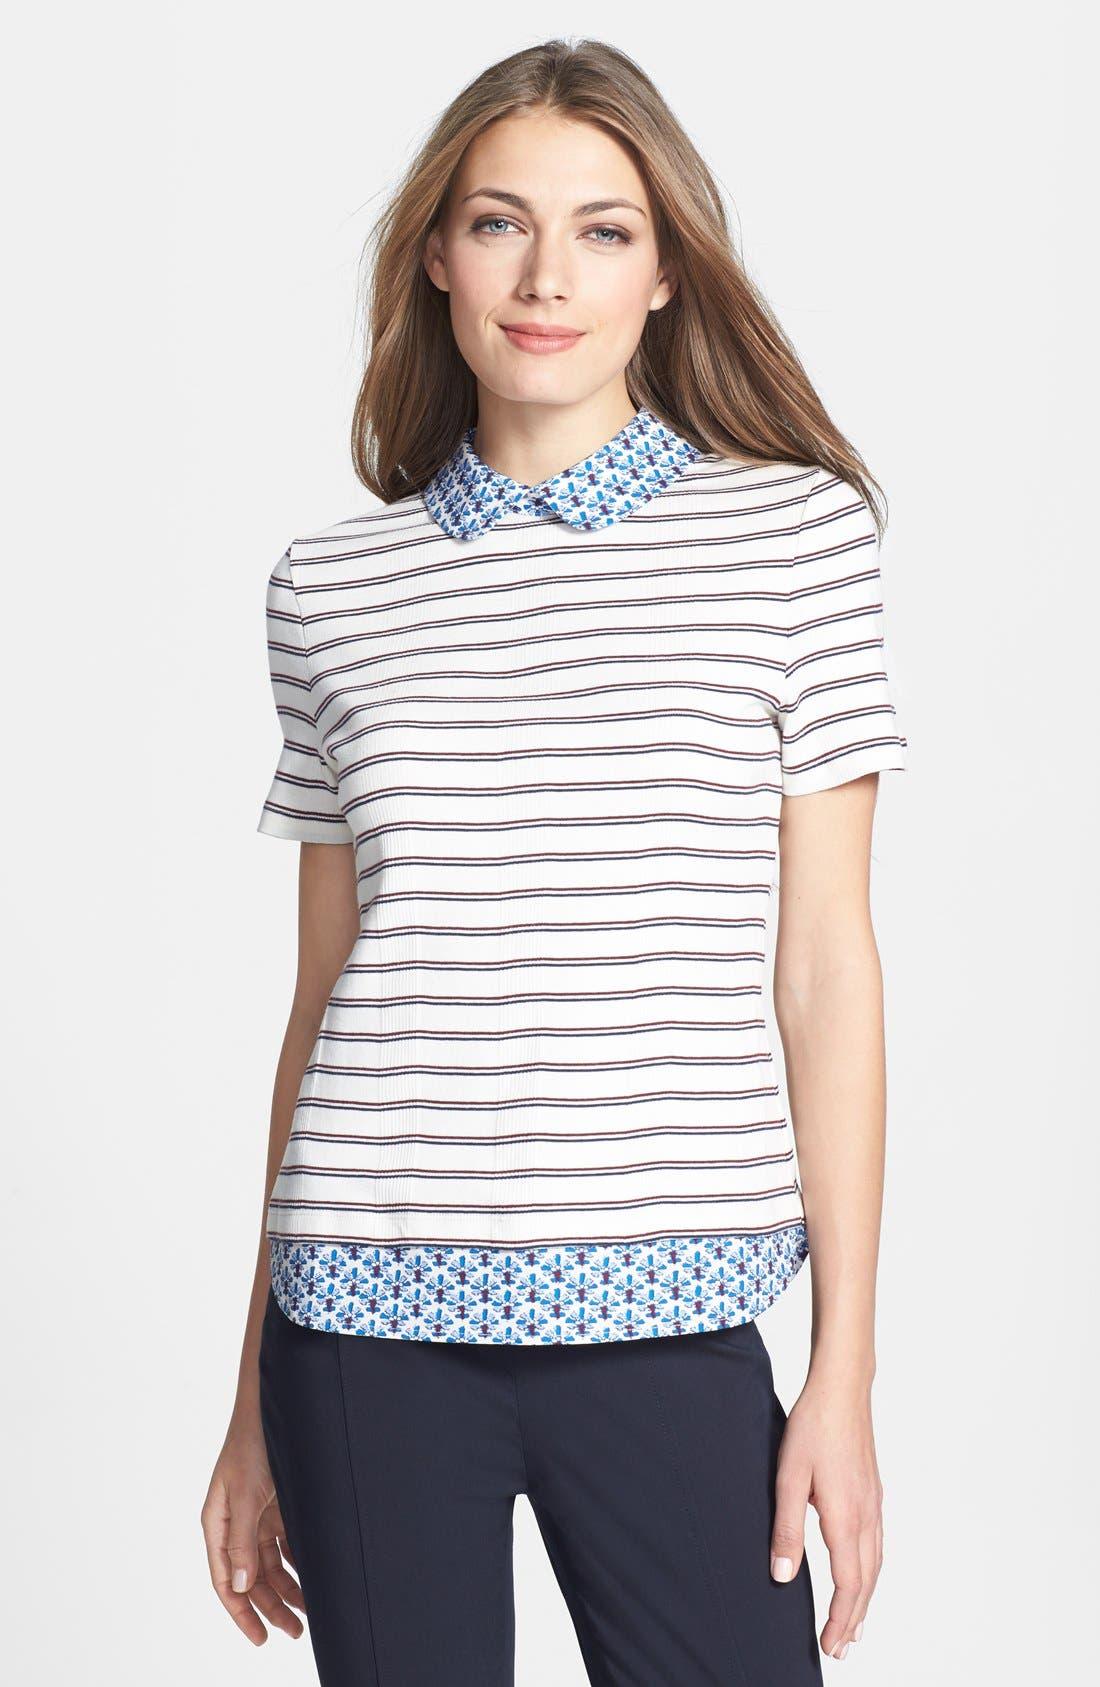 Alternate Image 1 Selected - Tory Burch 'Alexandria' Cotton Top